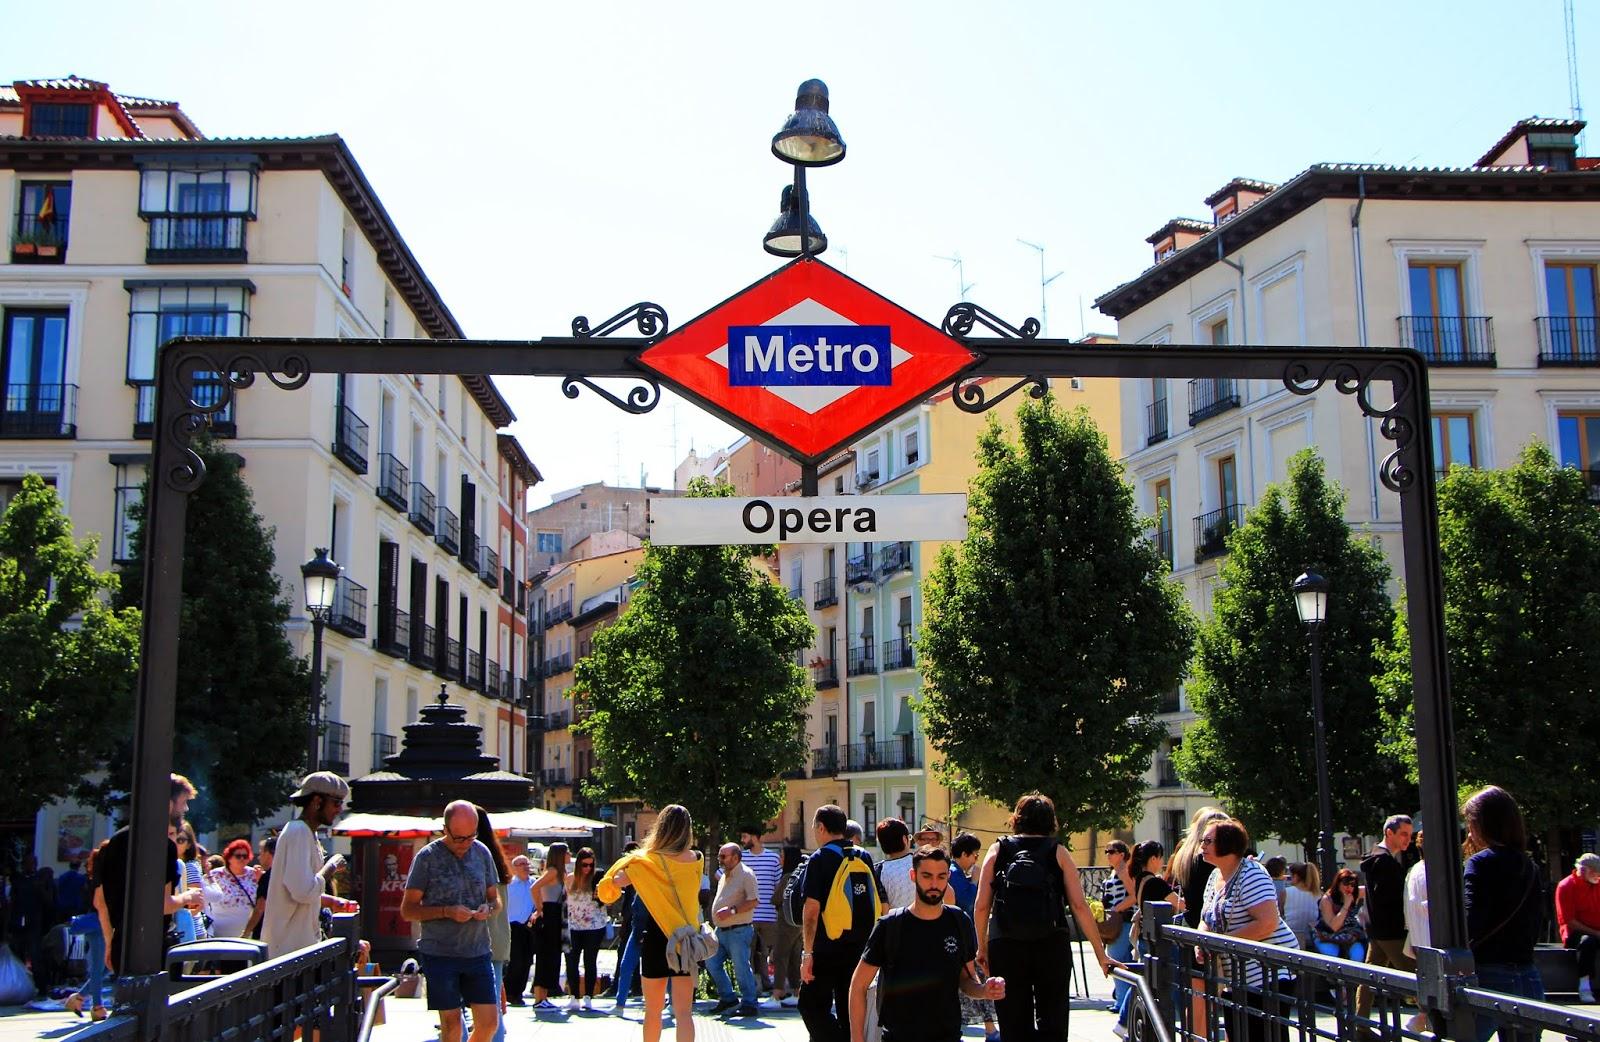 eleni-afiontzi-madrid metro sign